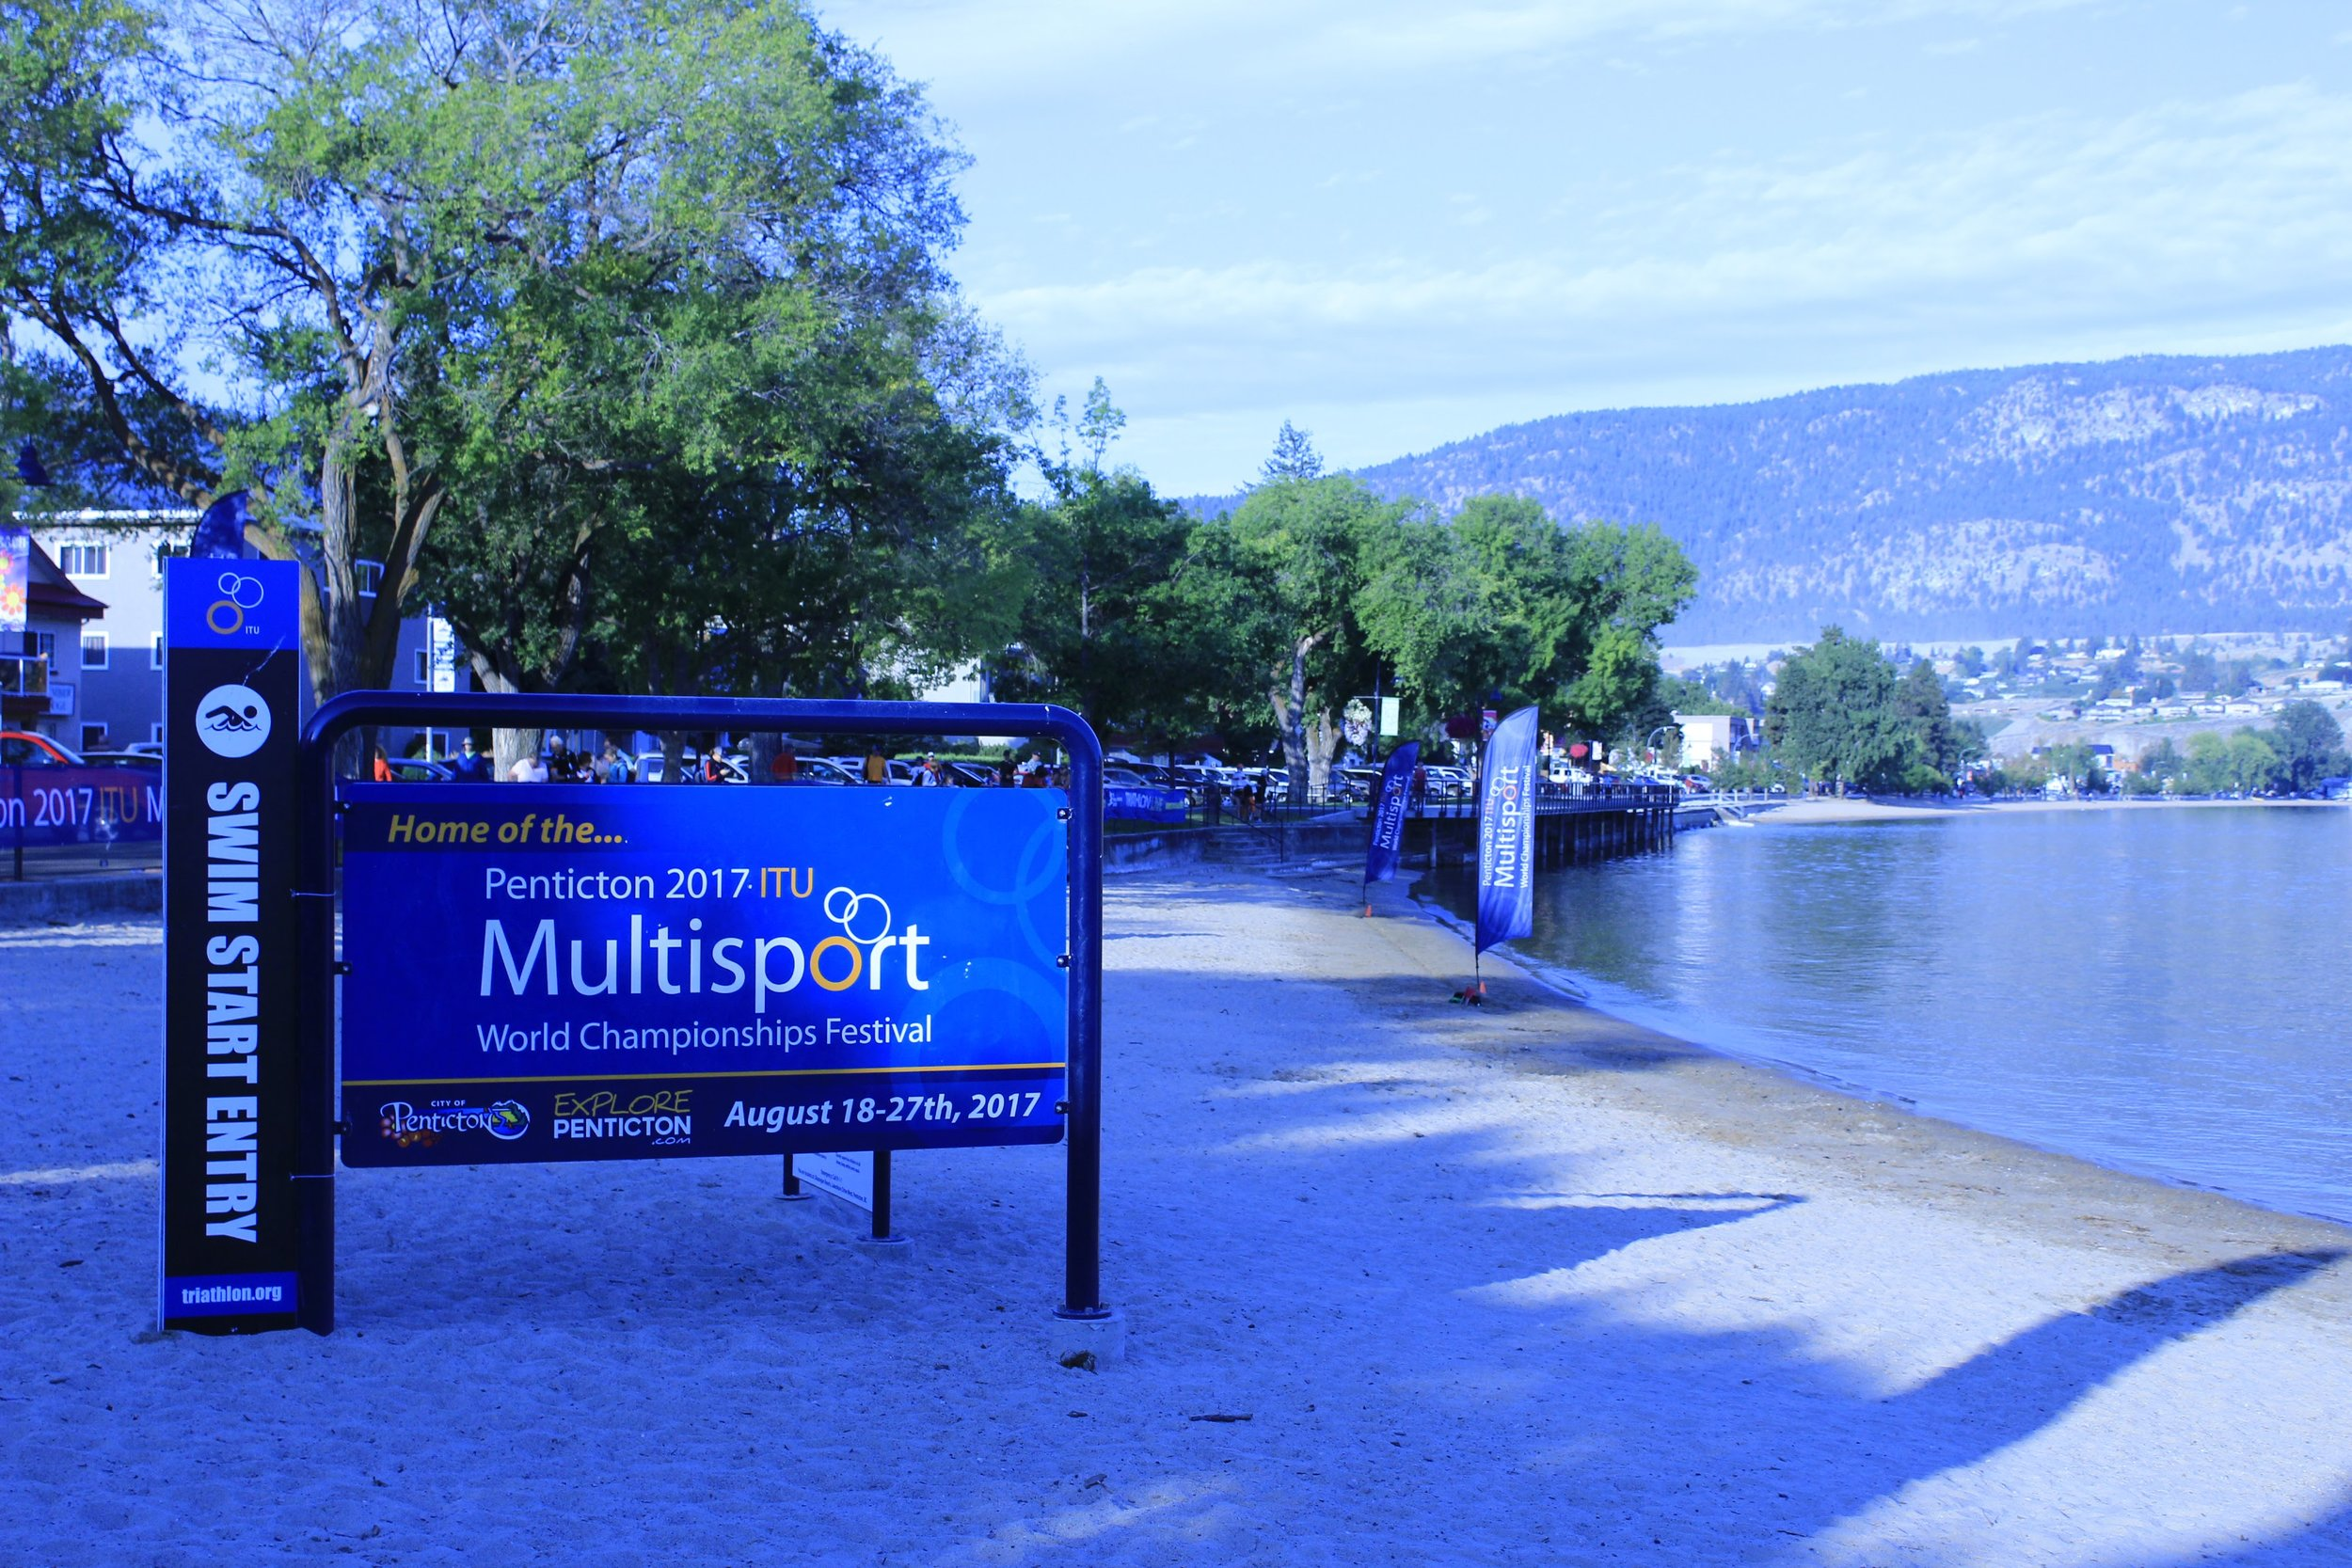 ITU Multisport World Championships Penticton